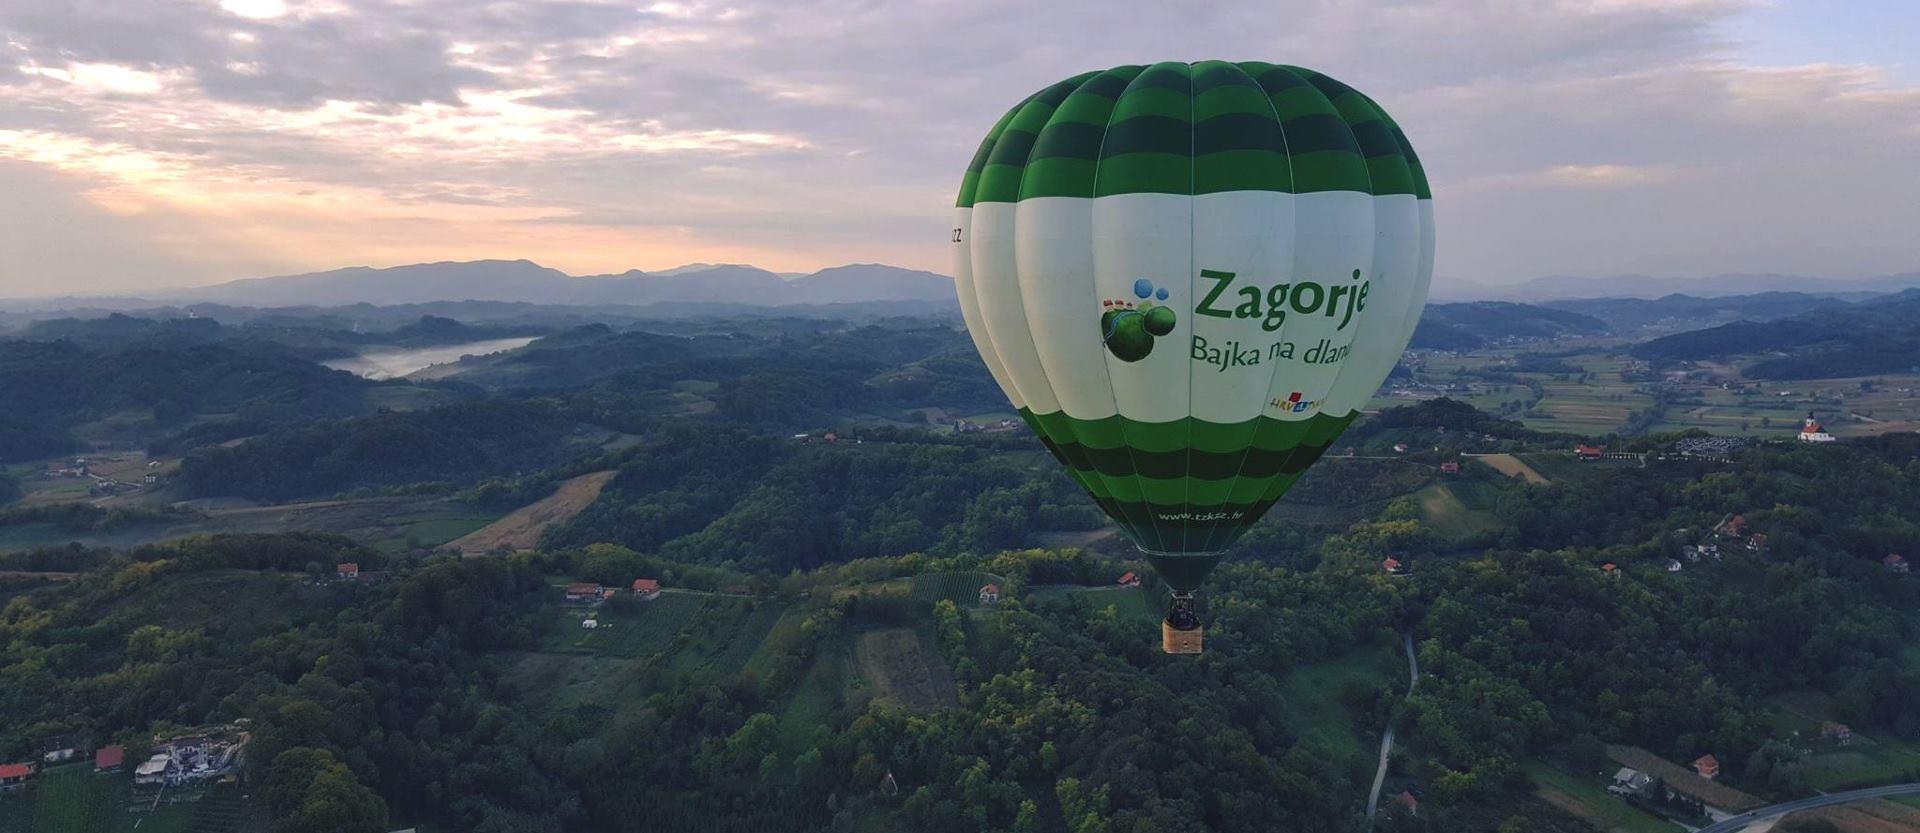 FOTO: Najatraktivniji outdoor event godine – Croatian Hot Air Balloon Rally 2017